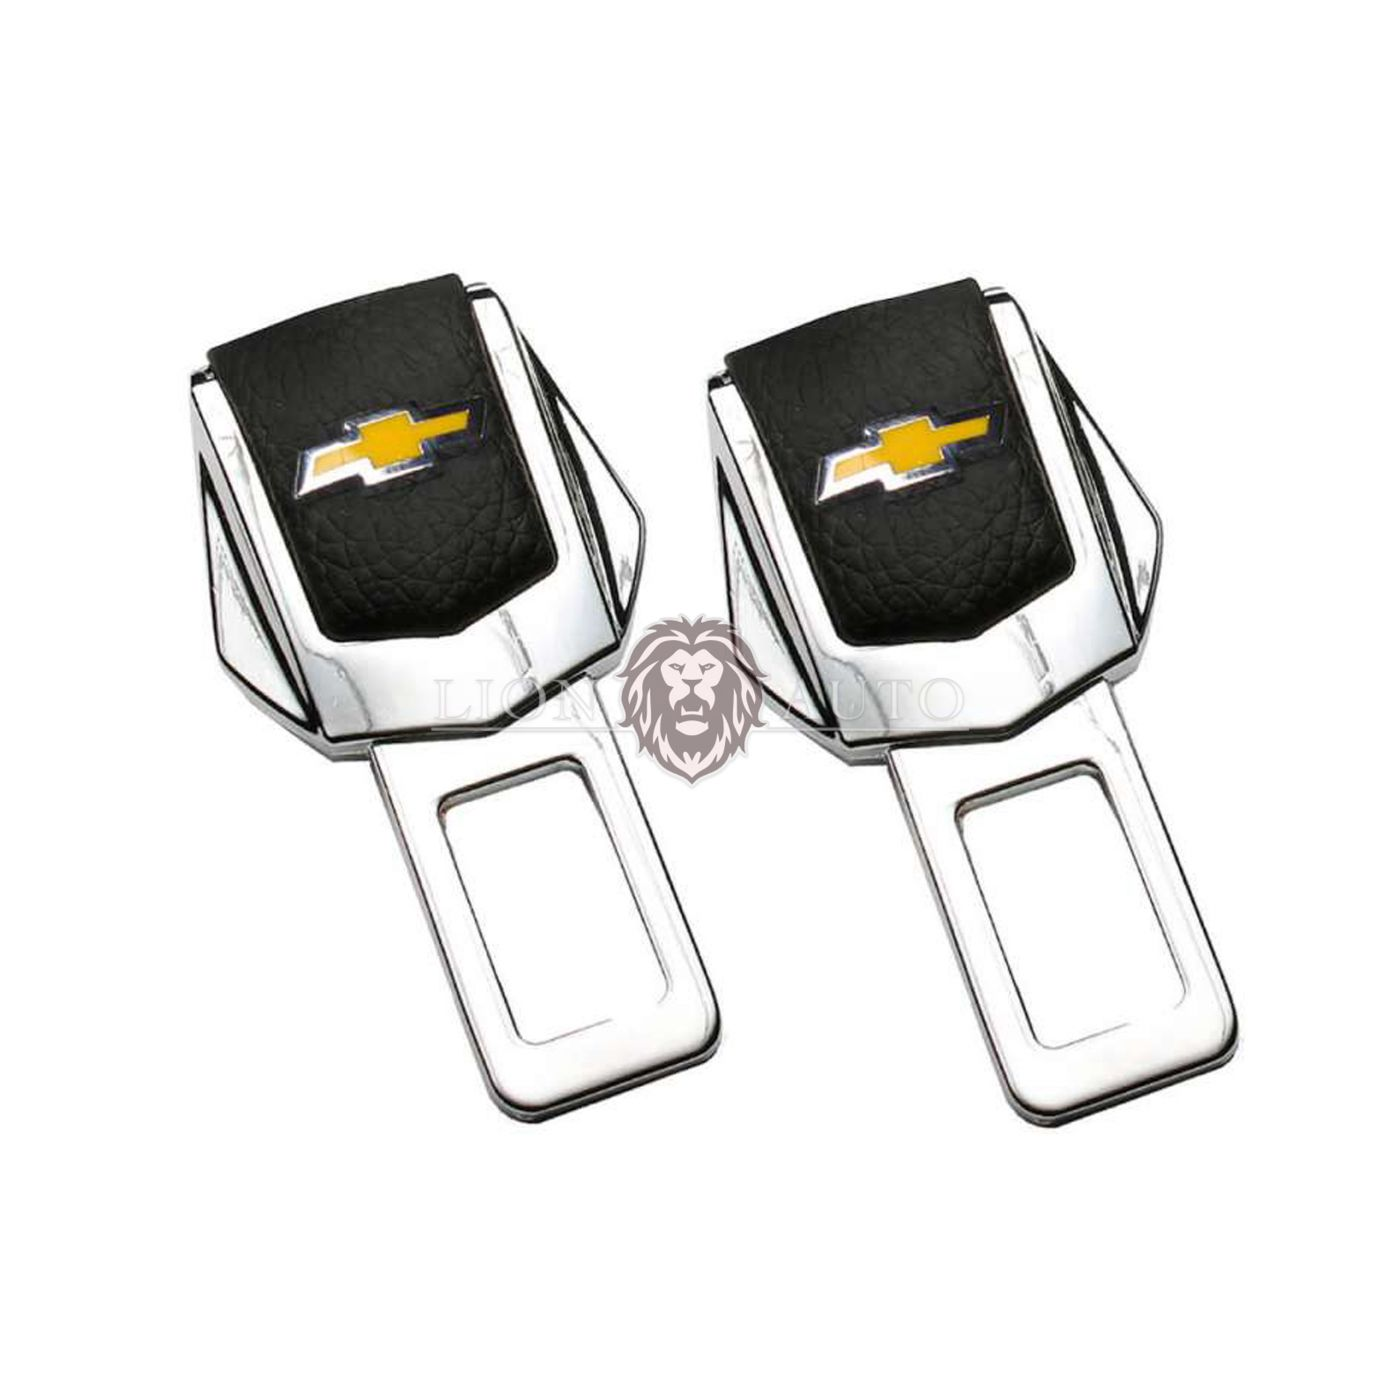 Заглушки ремня безопасности на Chevrolet (набор)